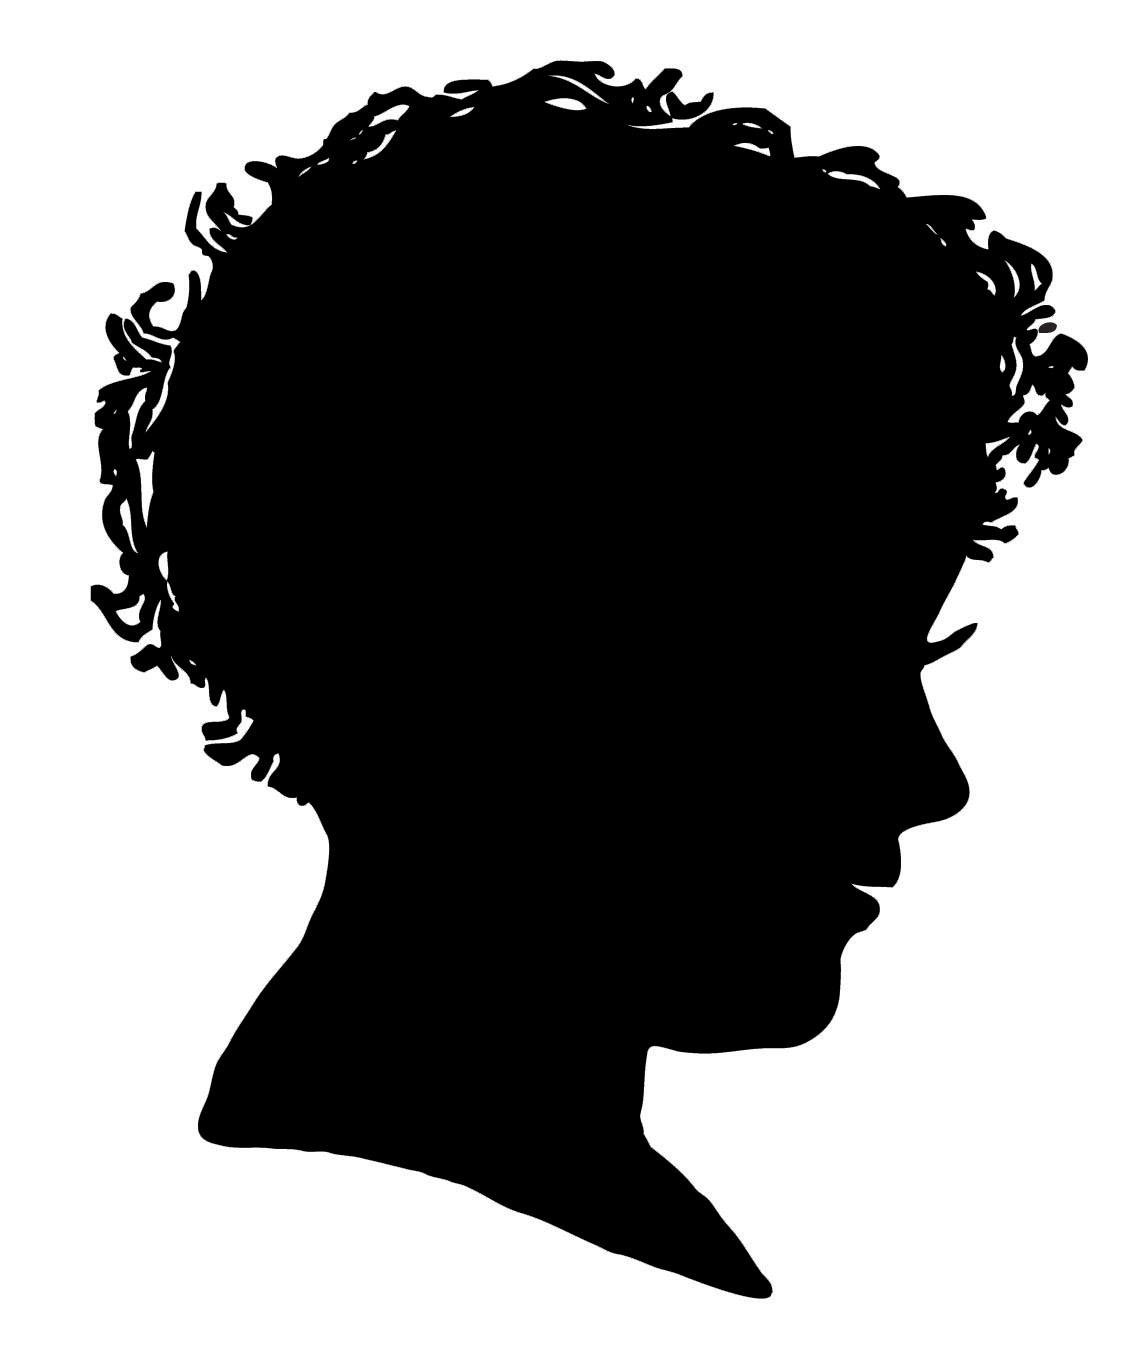 Vintage Clip Art - Silhouette Boy & Girl - The Graphics Fairy